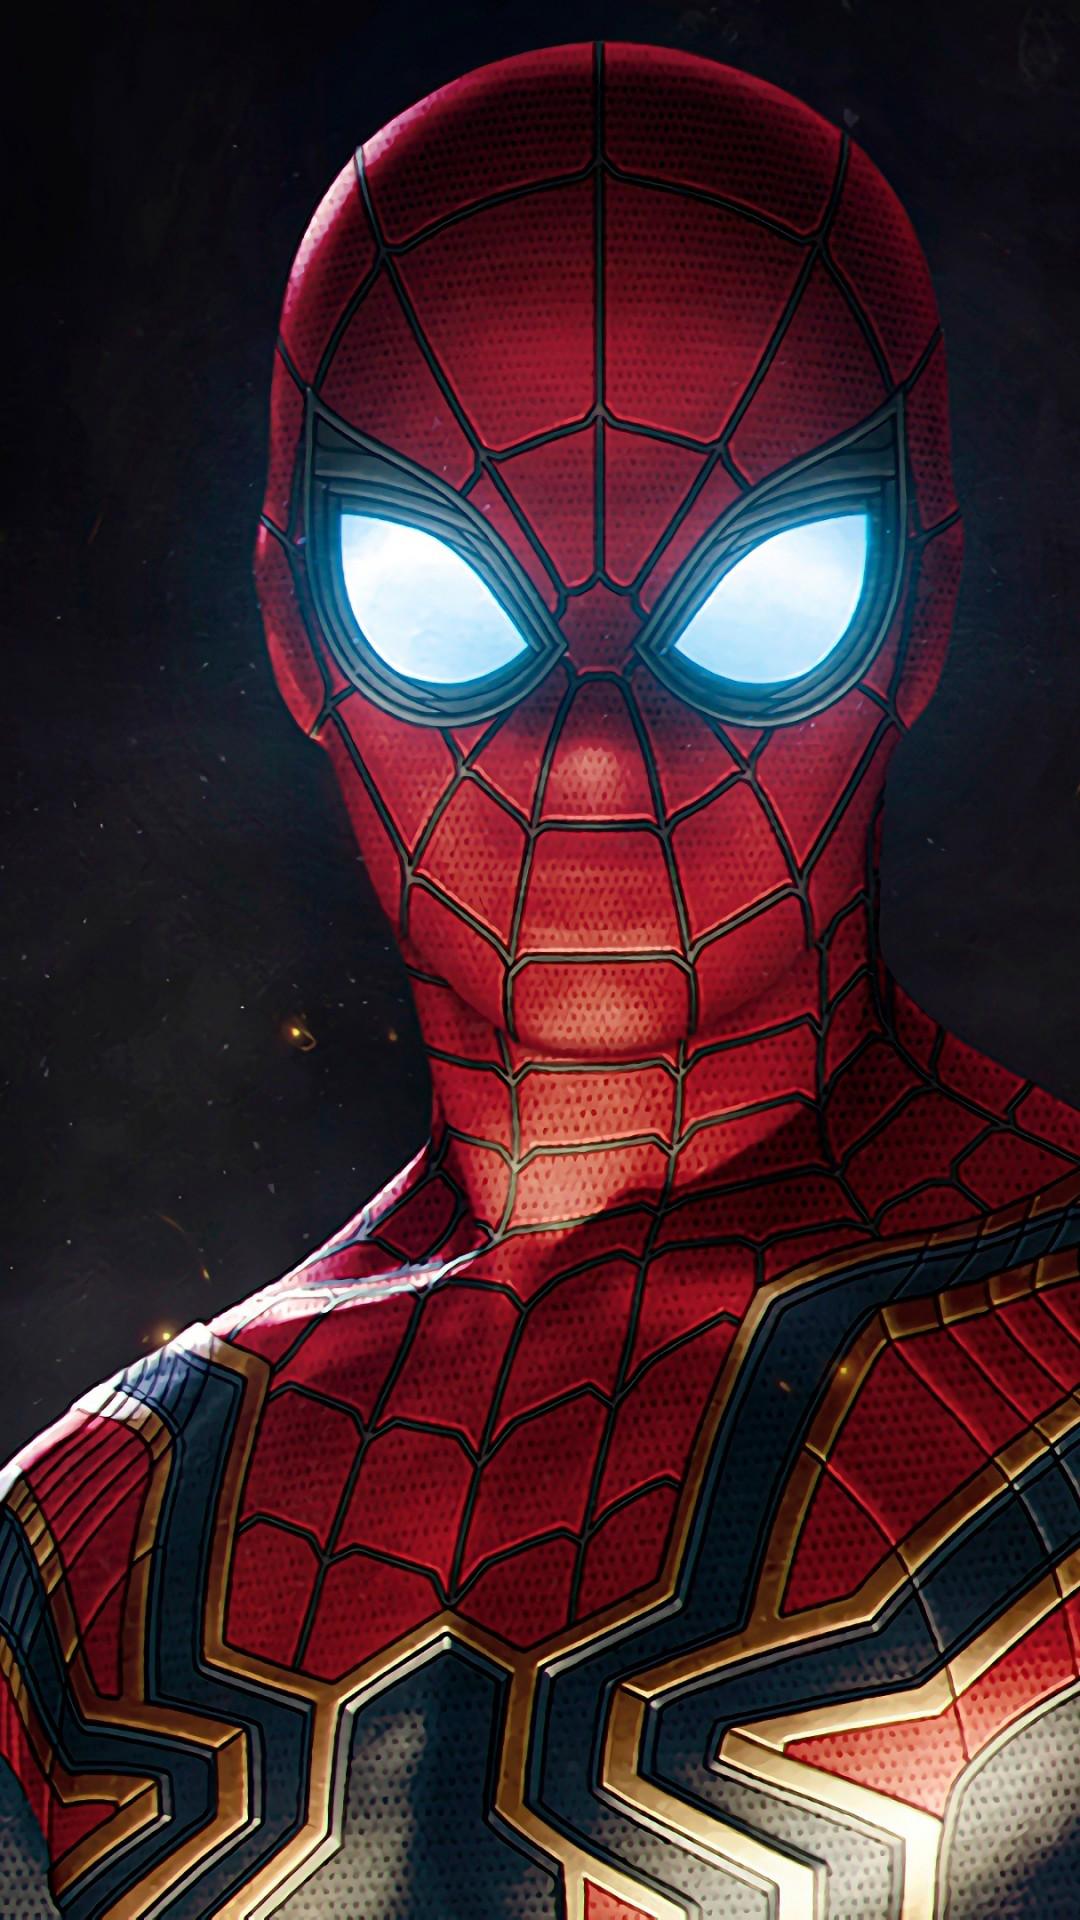 Spider Man in Avengers Infinity War 4K